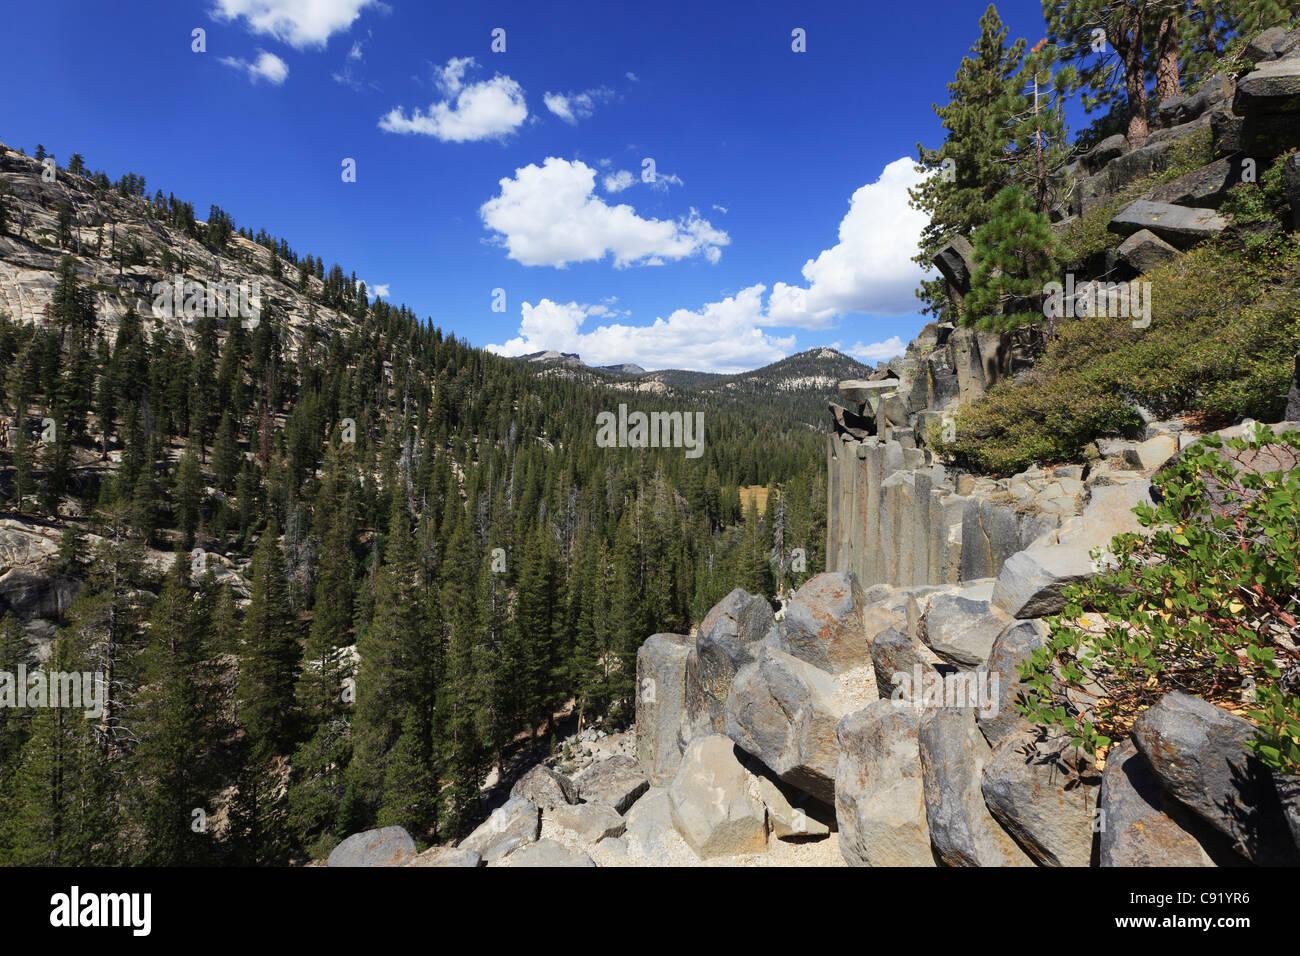 Basalt columns at Devils Postpile National Monument in California mountains - Stock Image